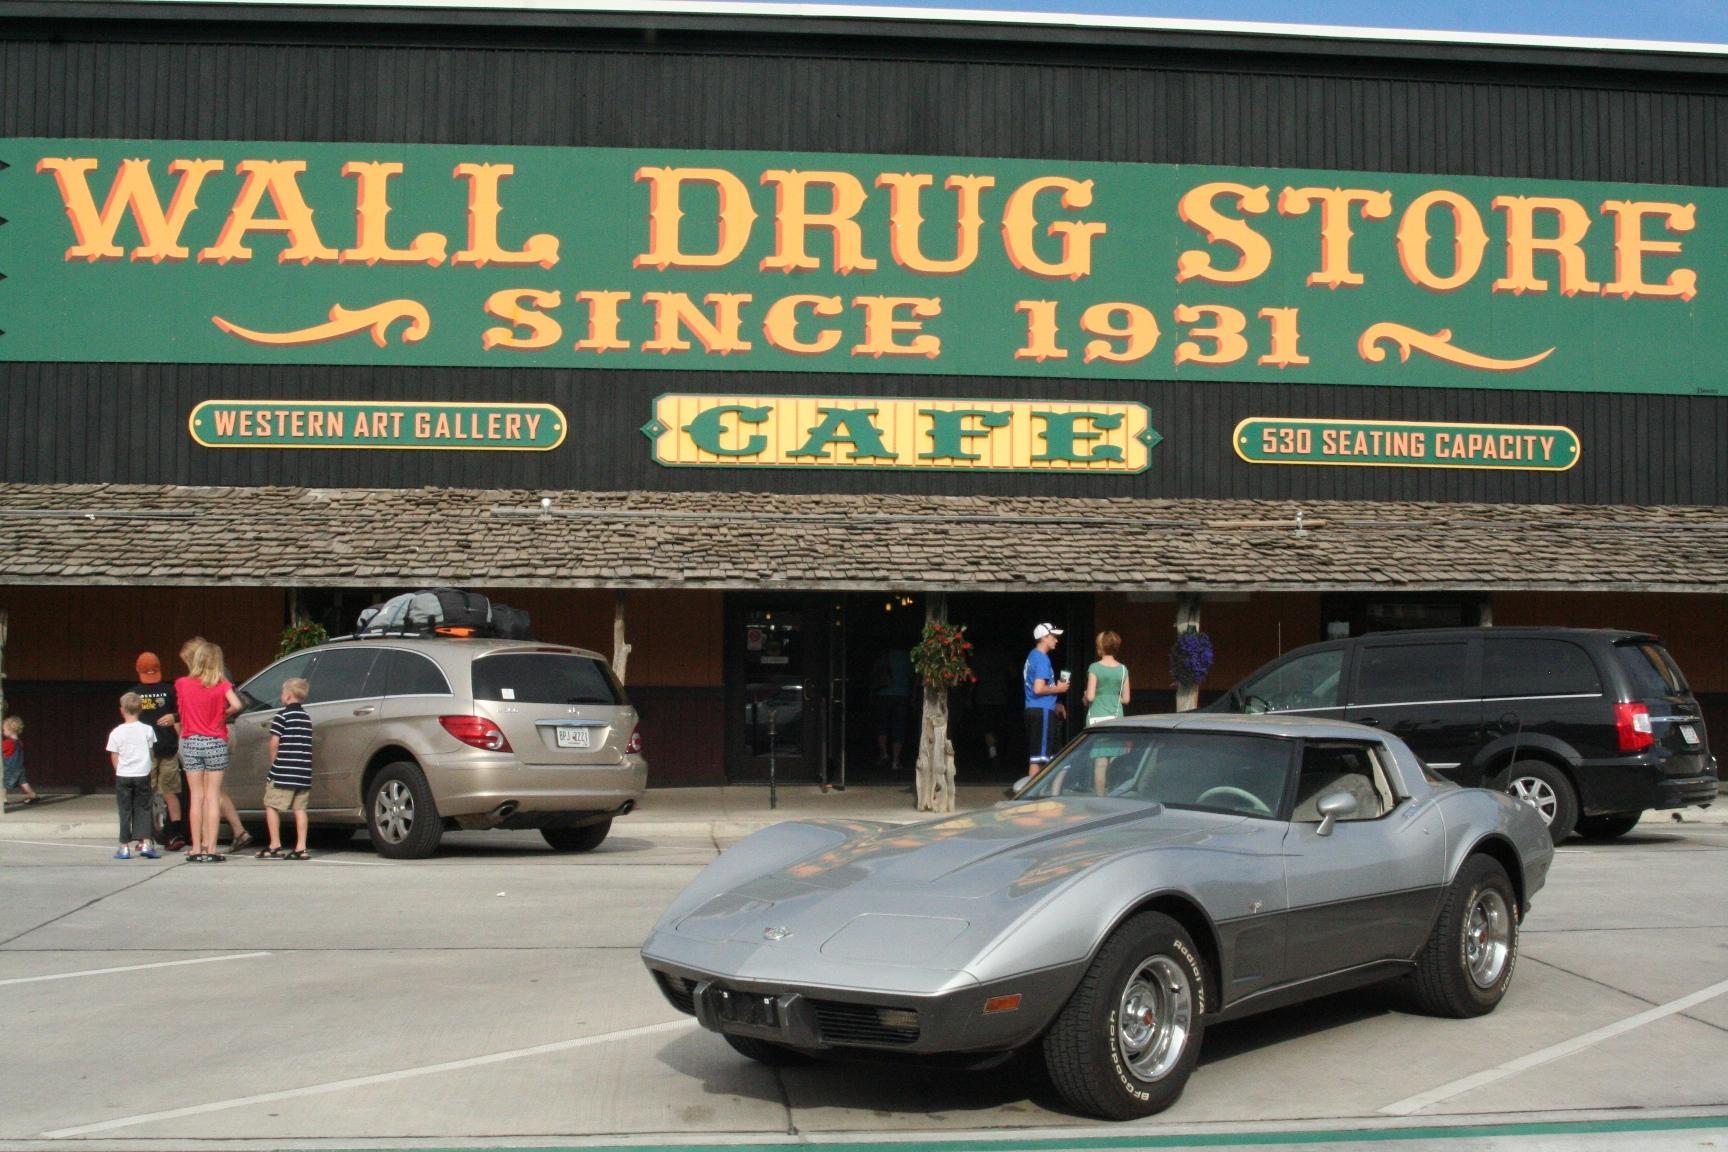 Wall Drug Store, Wall, So. Dakota